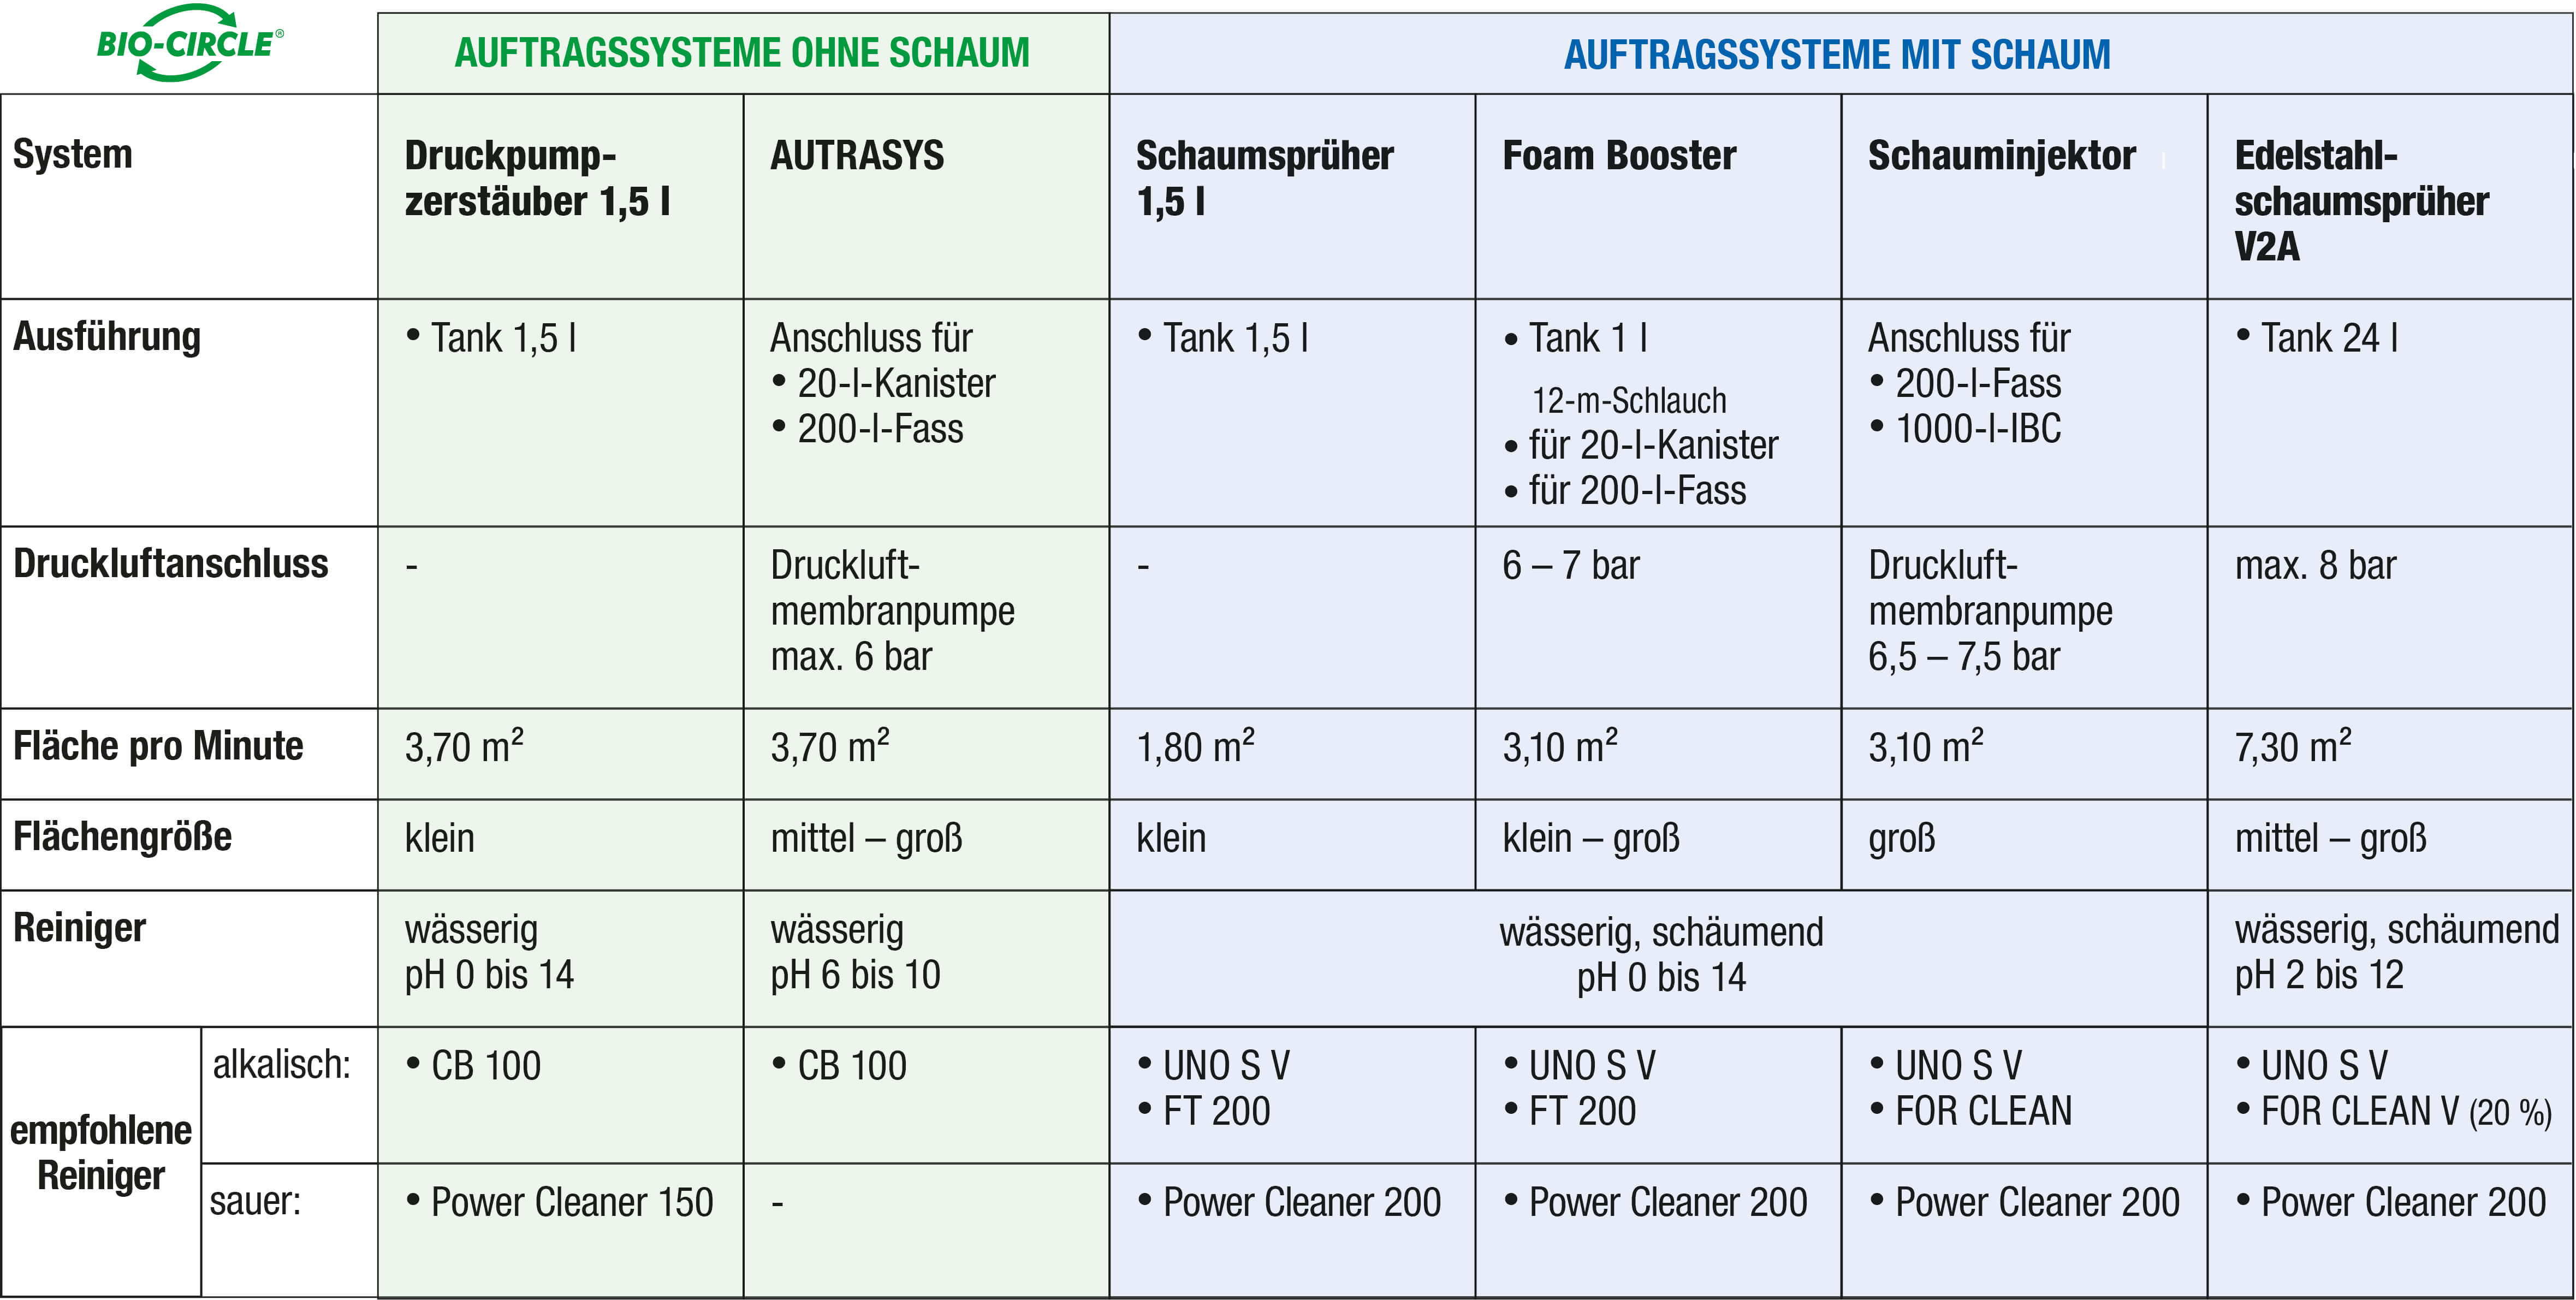 Auftragssysteme_Vergleich_DE_a